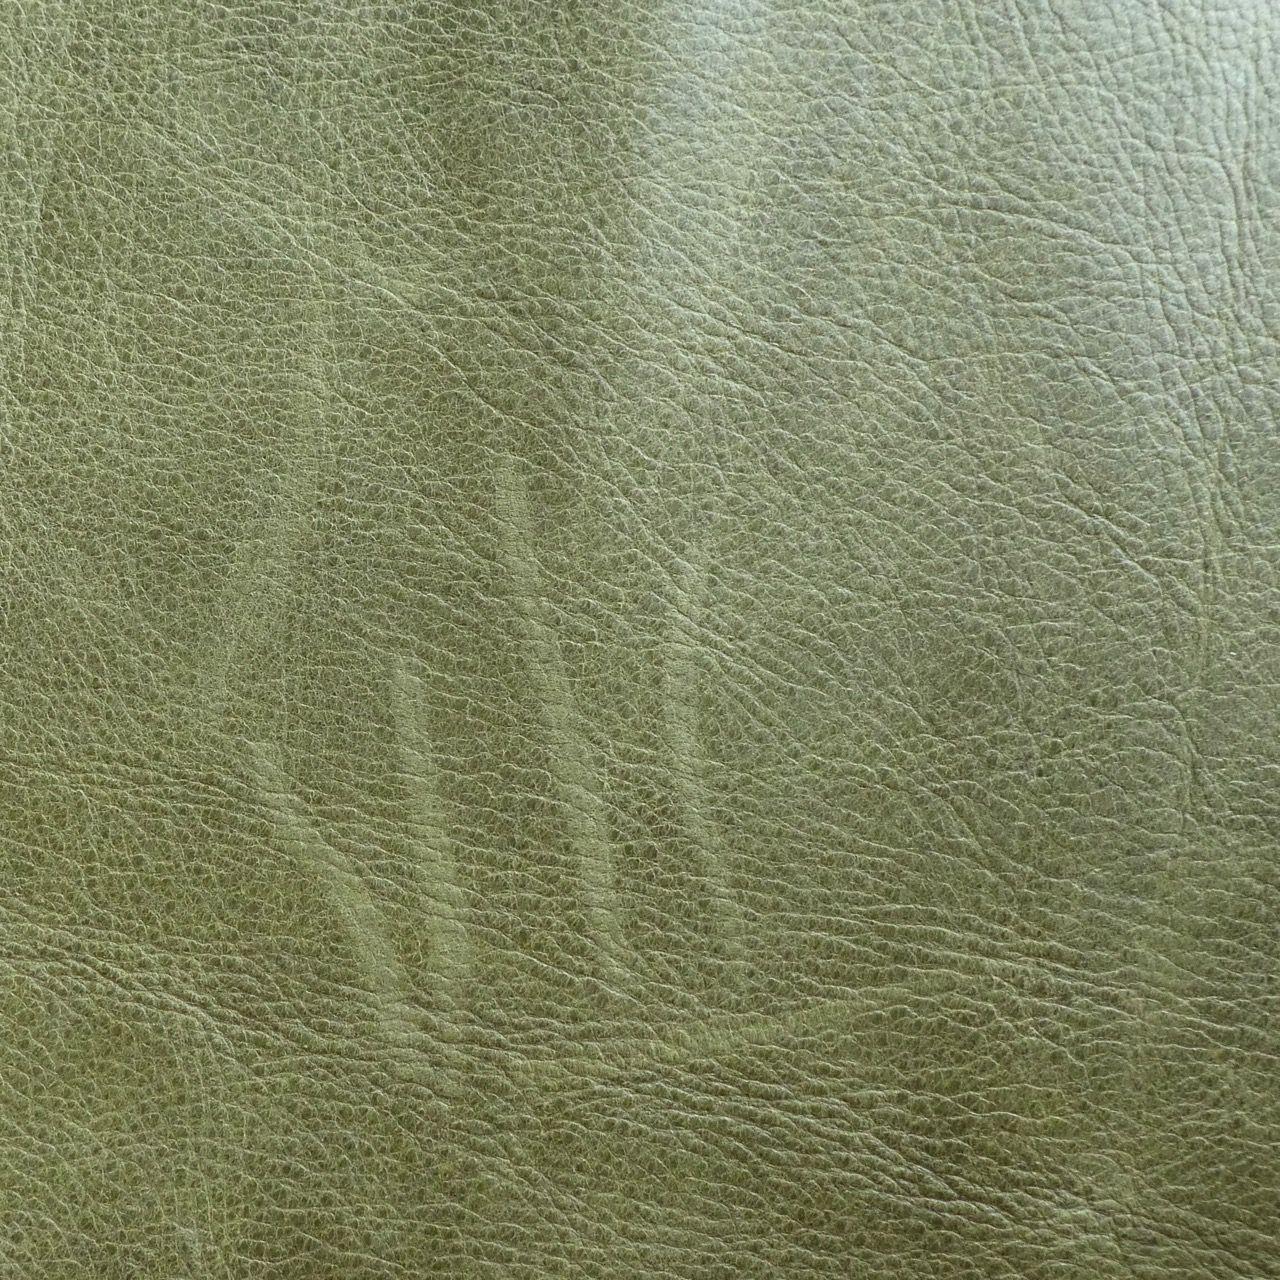 Antigo Olive - Leather